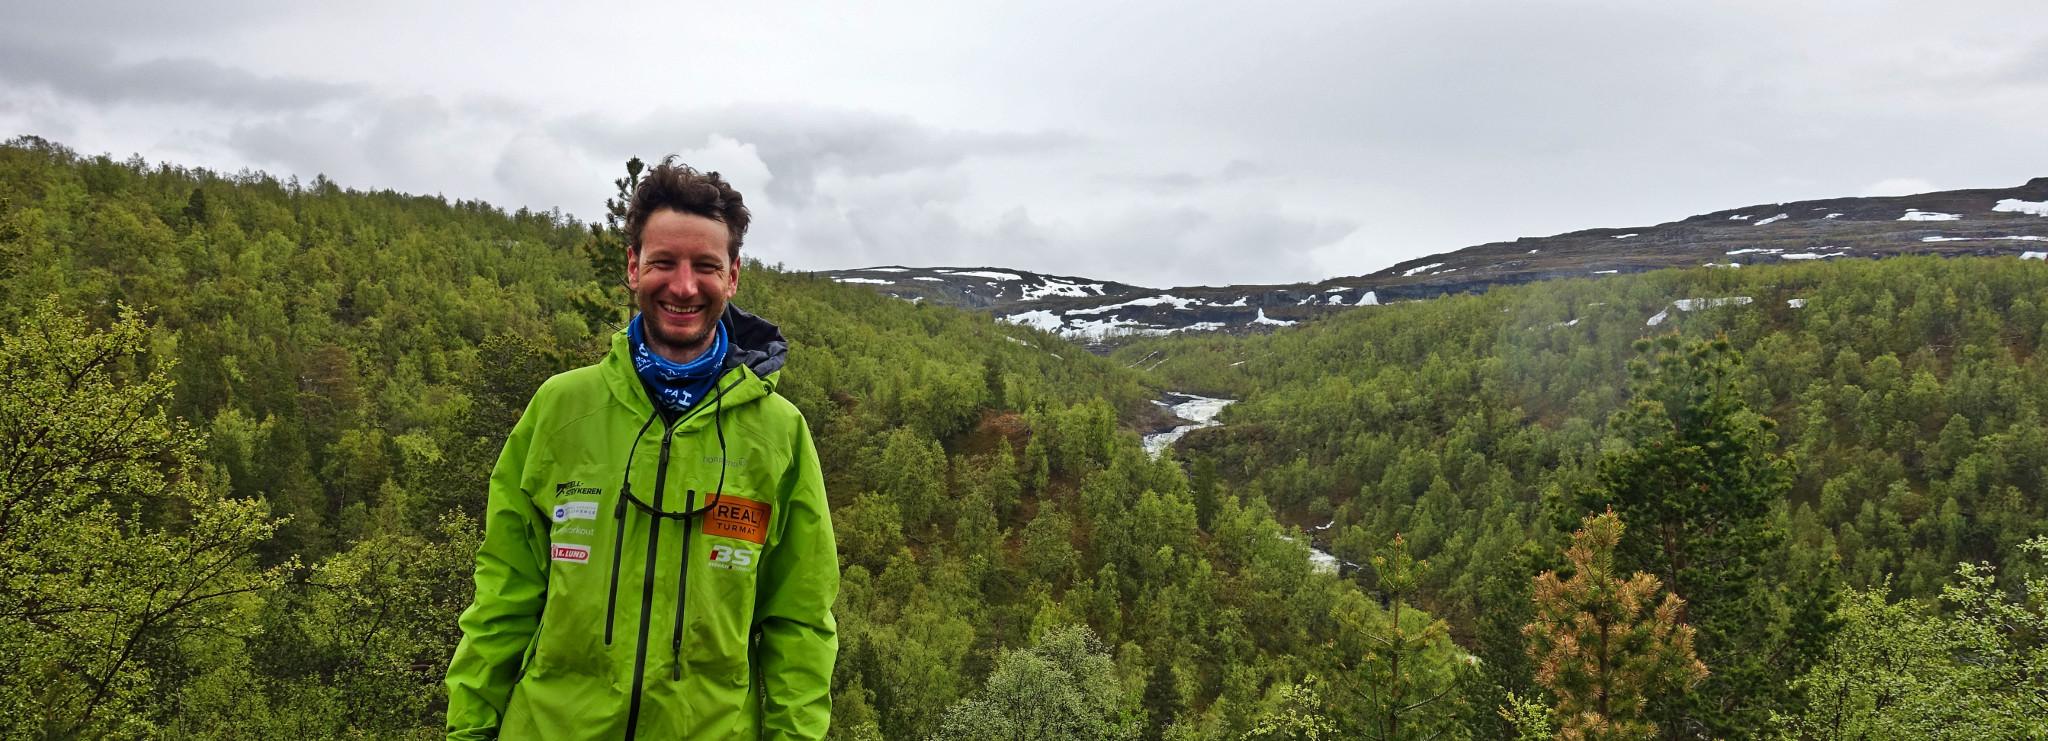 En blid og fornøyd Fredrik Karlstad - Du kommer langt lengre med en positiv innstilling!